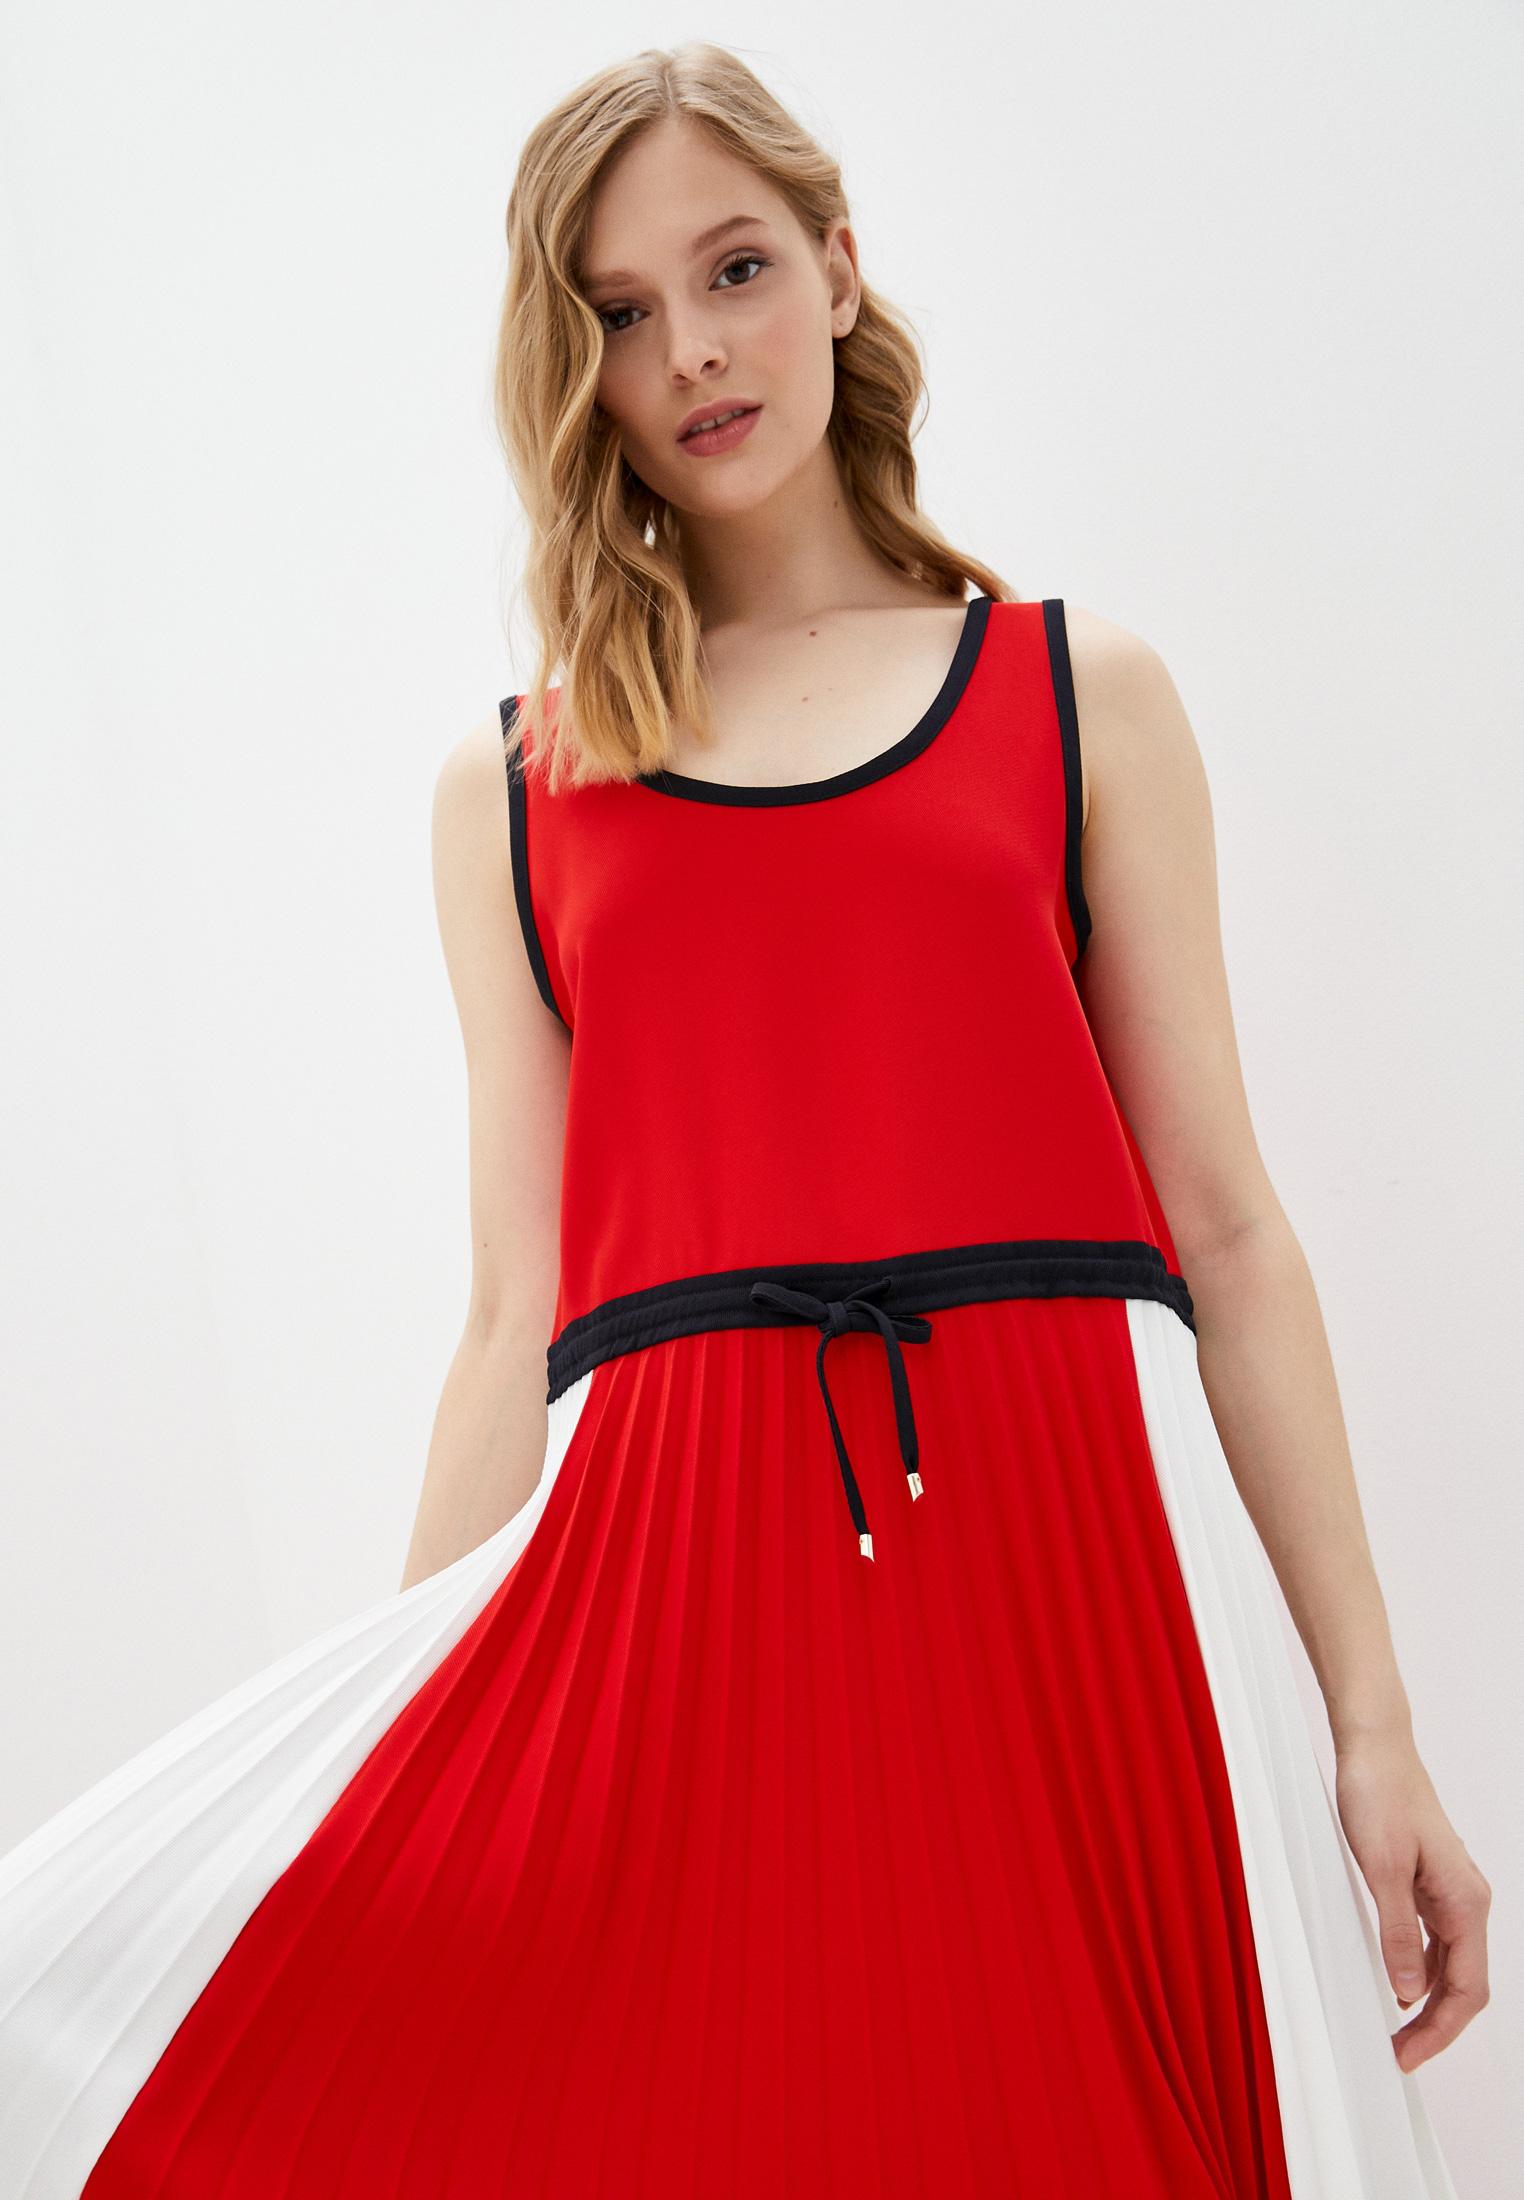 Женские платья-сарафаны Tommy Hilfiger (Томми Хилфигер) WW0WW30643: изображение 2